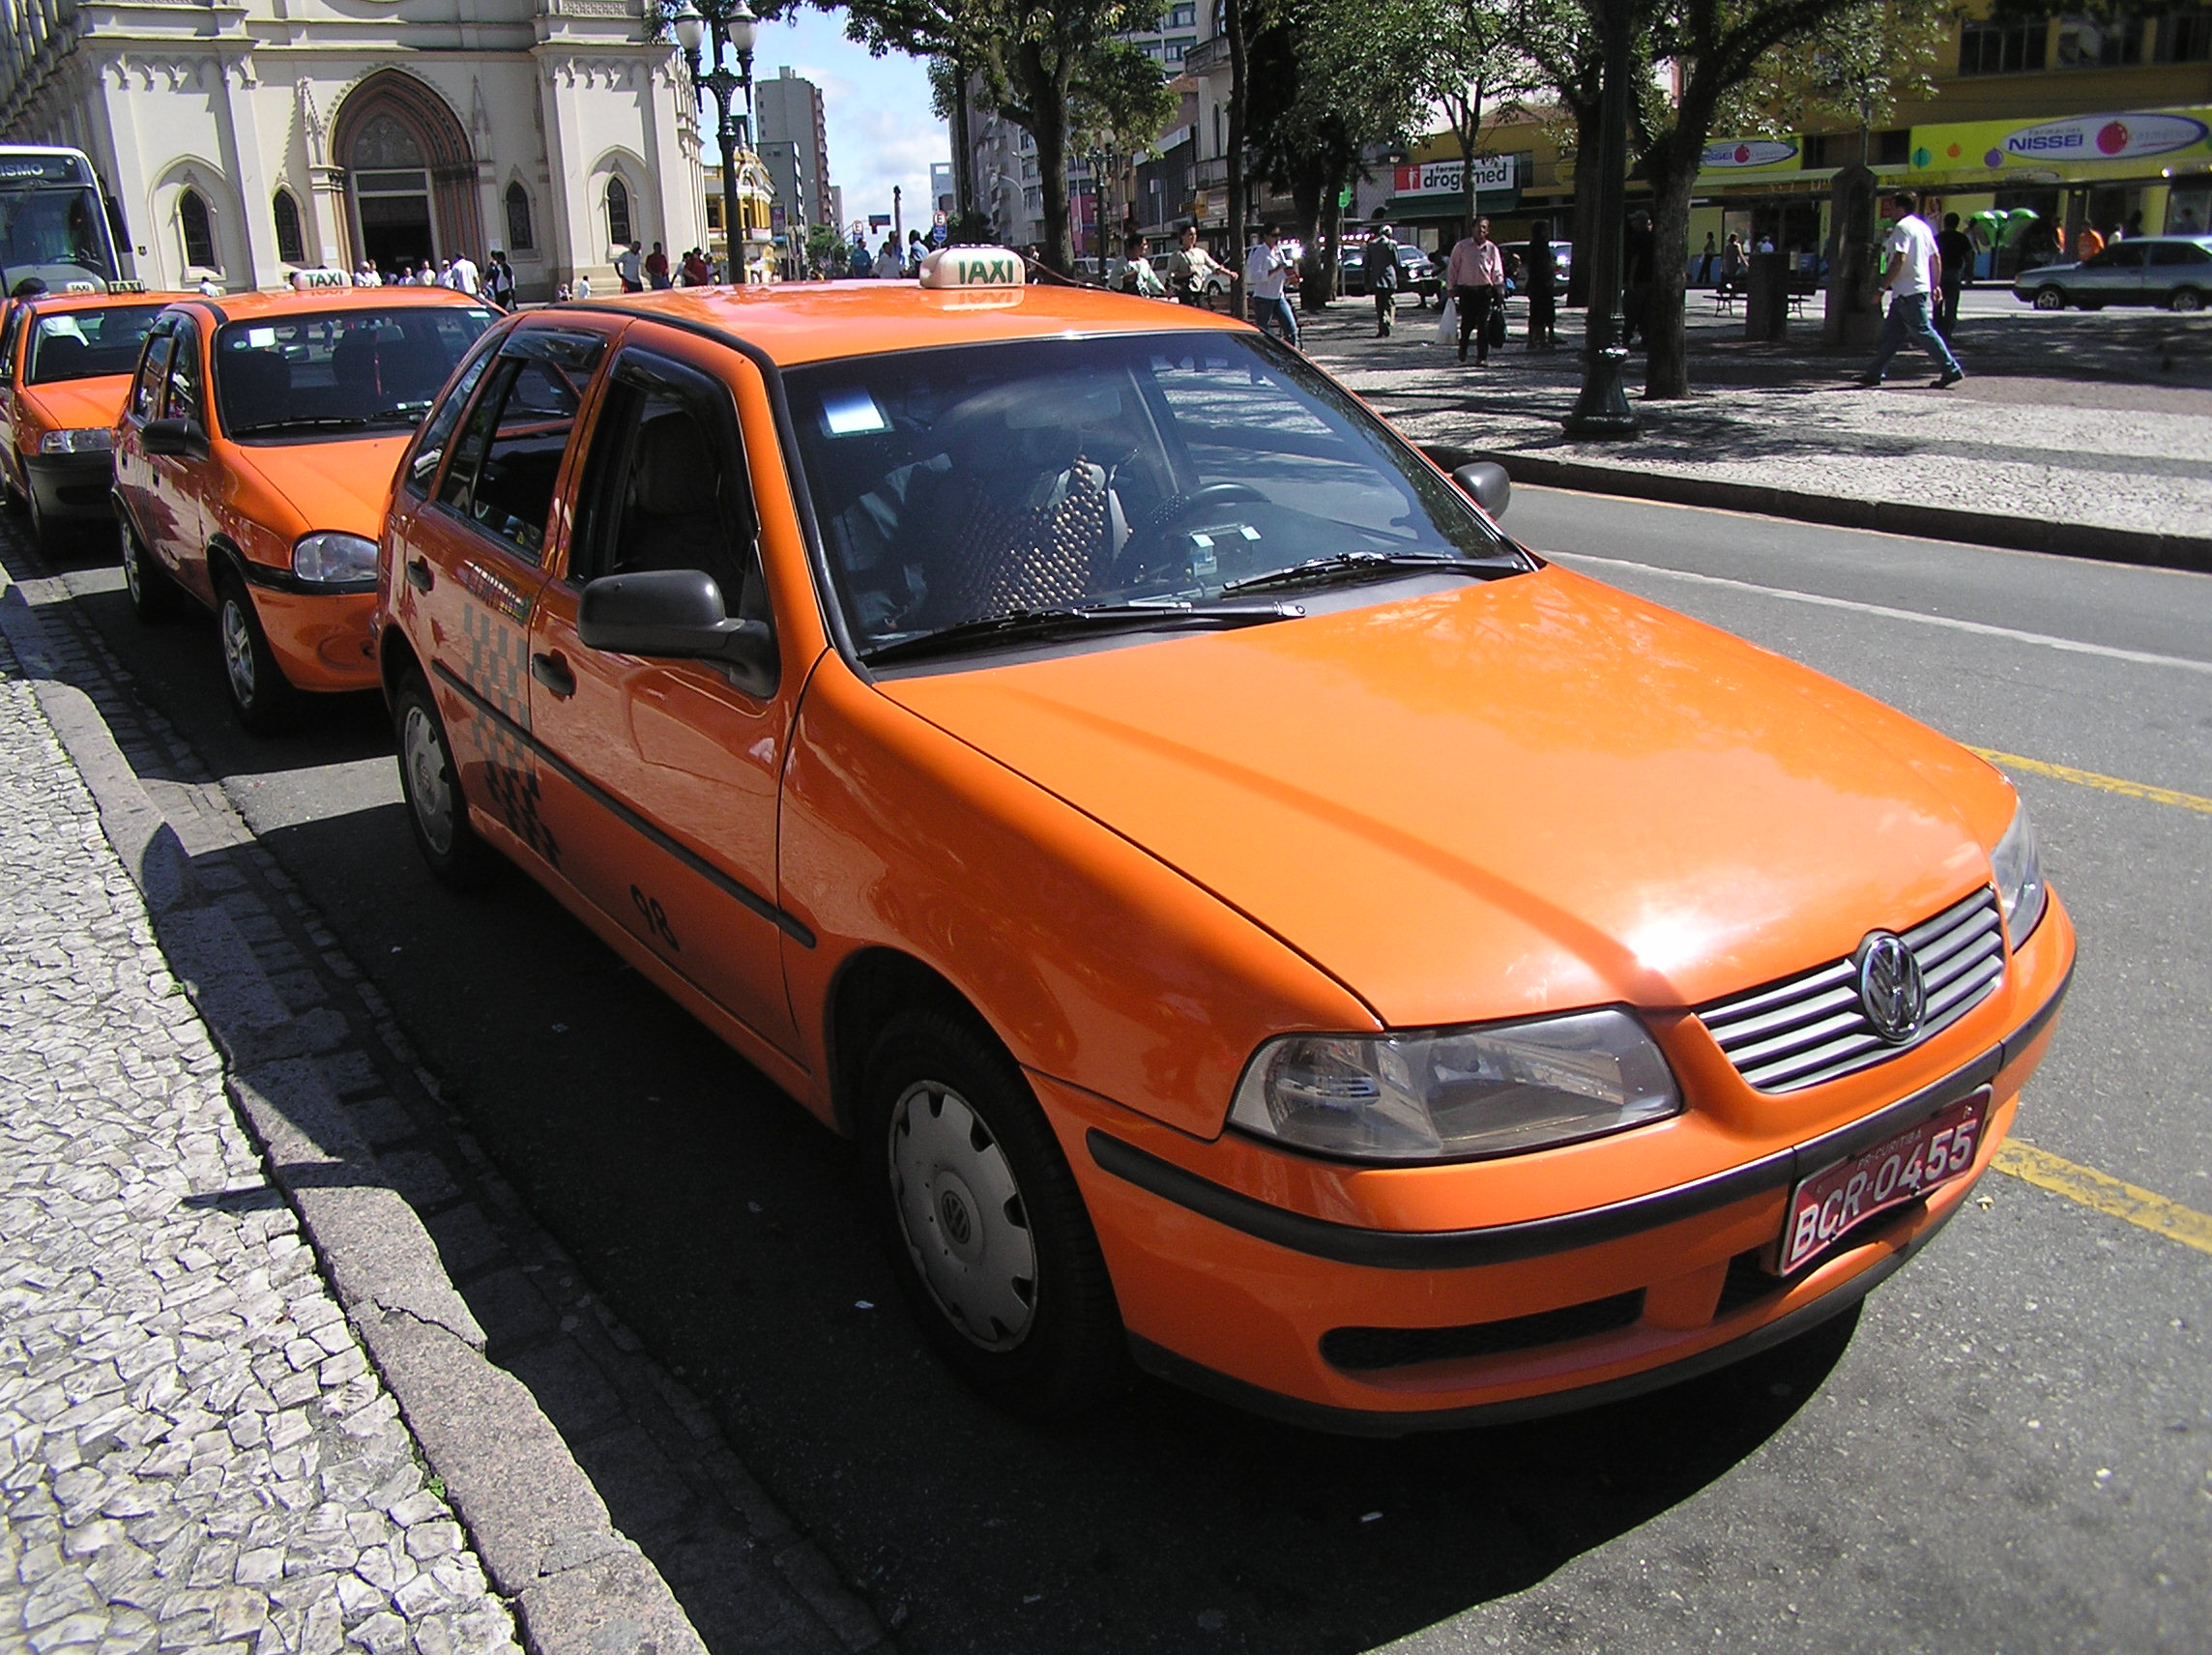 Orange Colour Taxis.